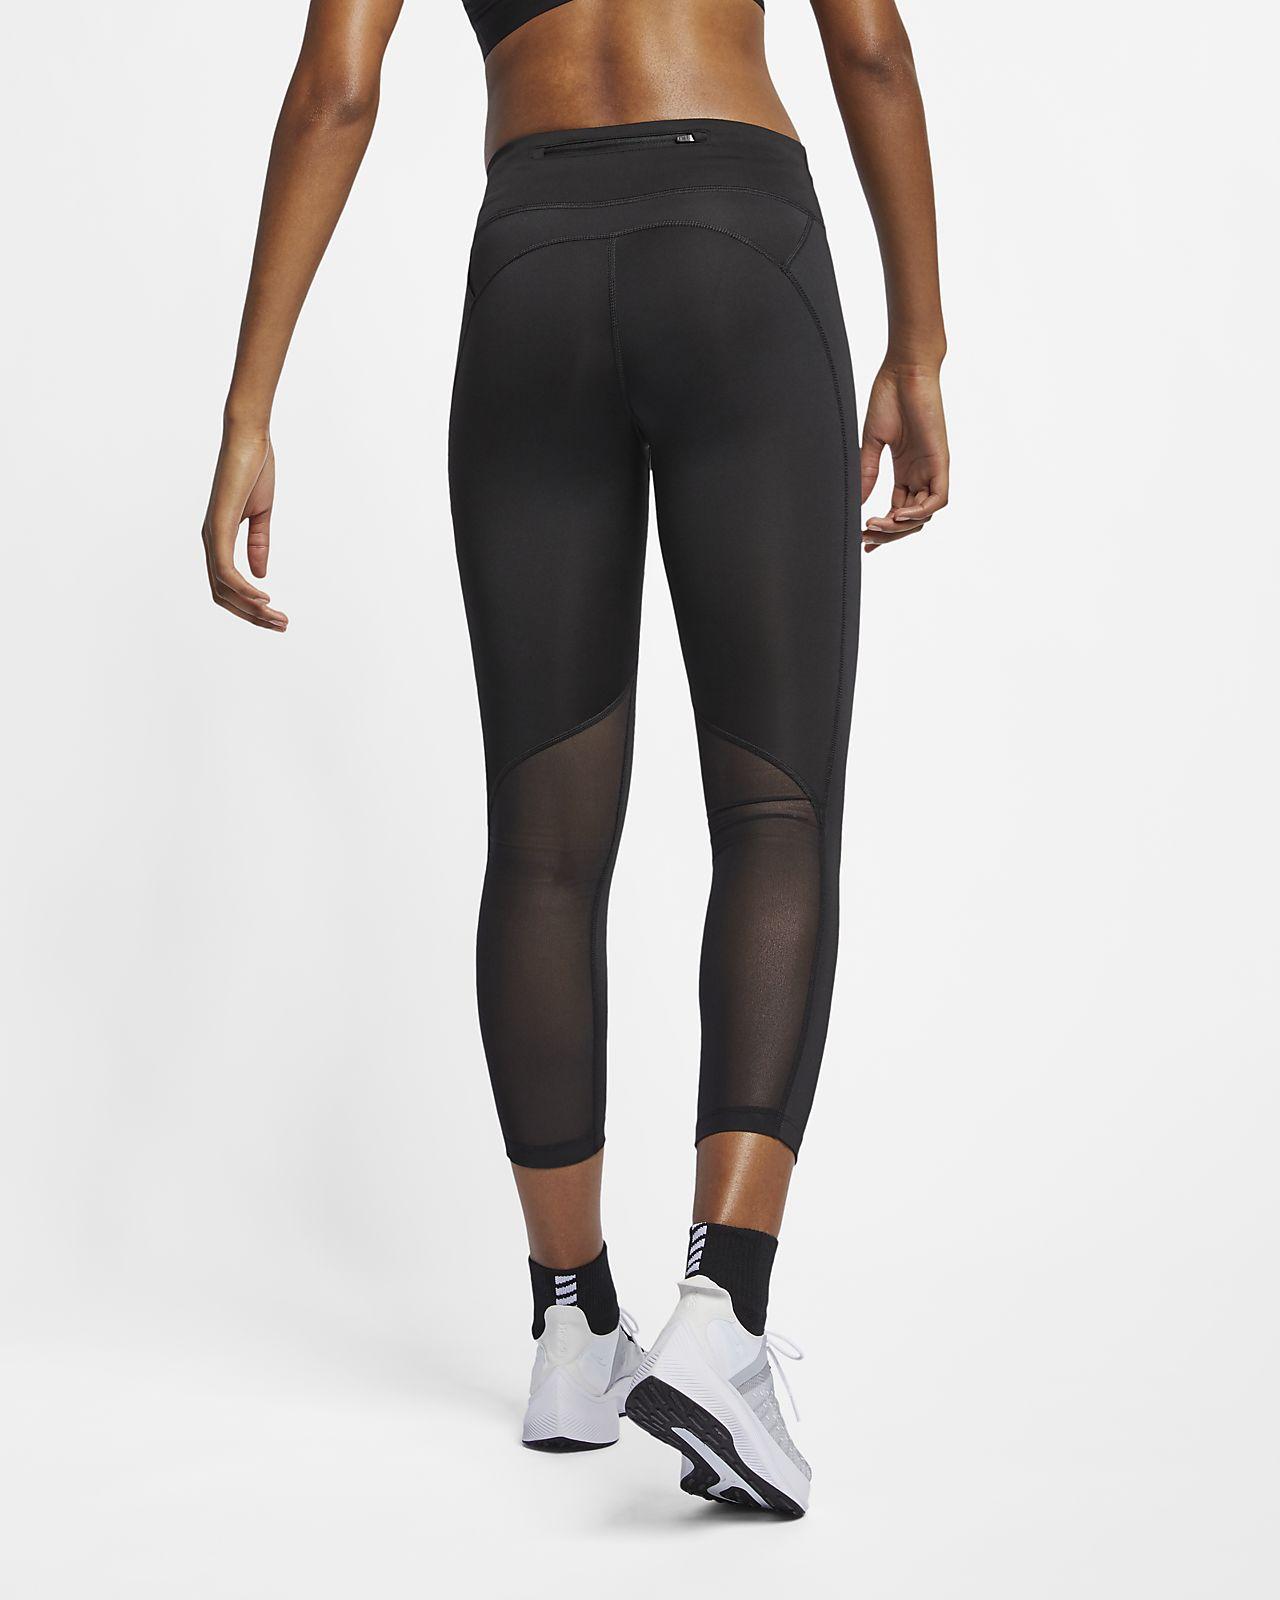 Nike Fast Women's 78 Running Crops